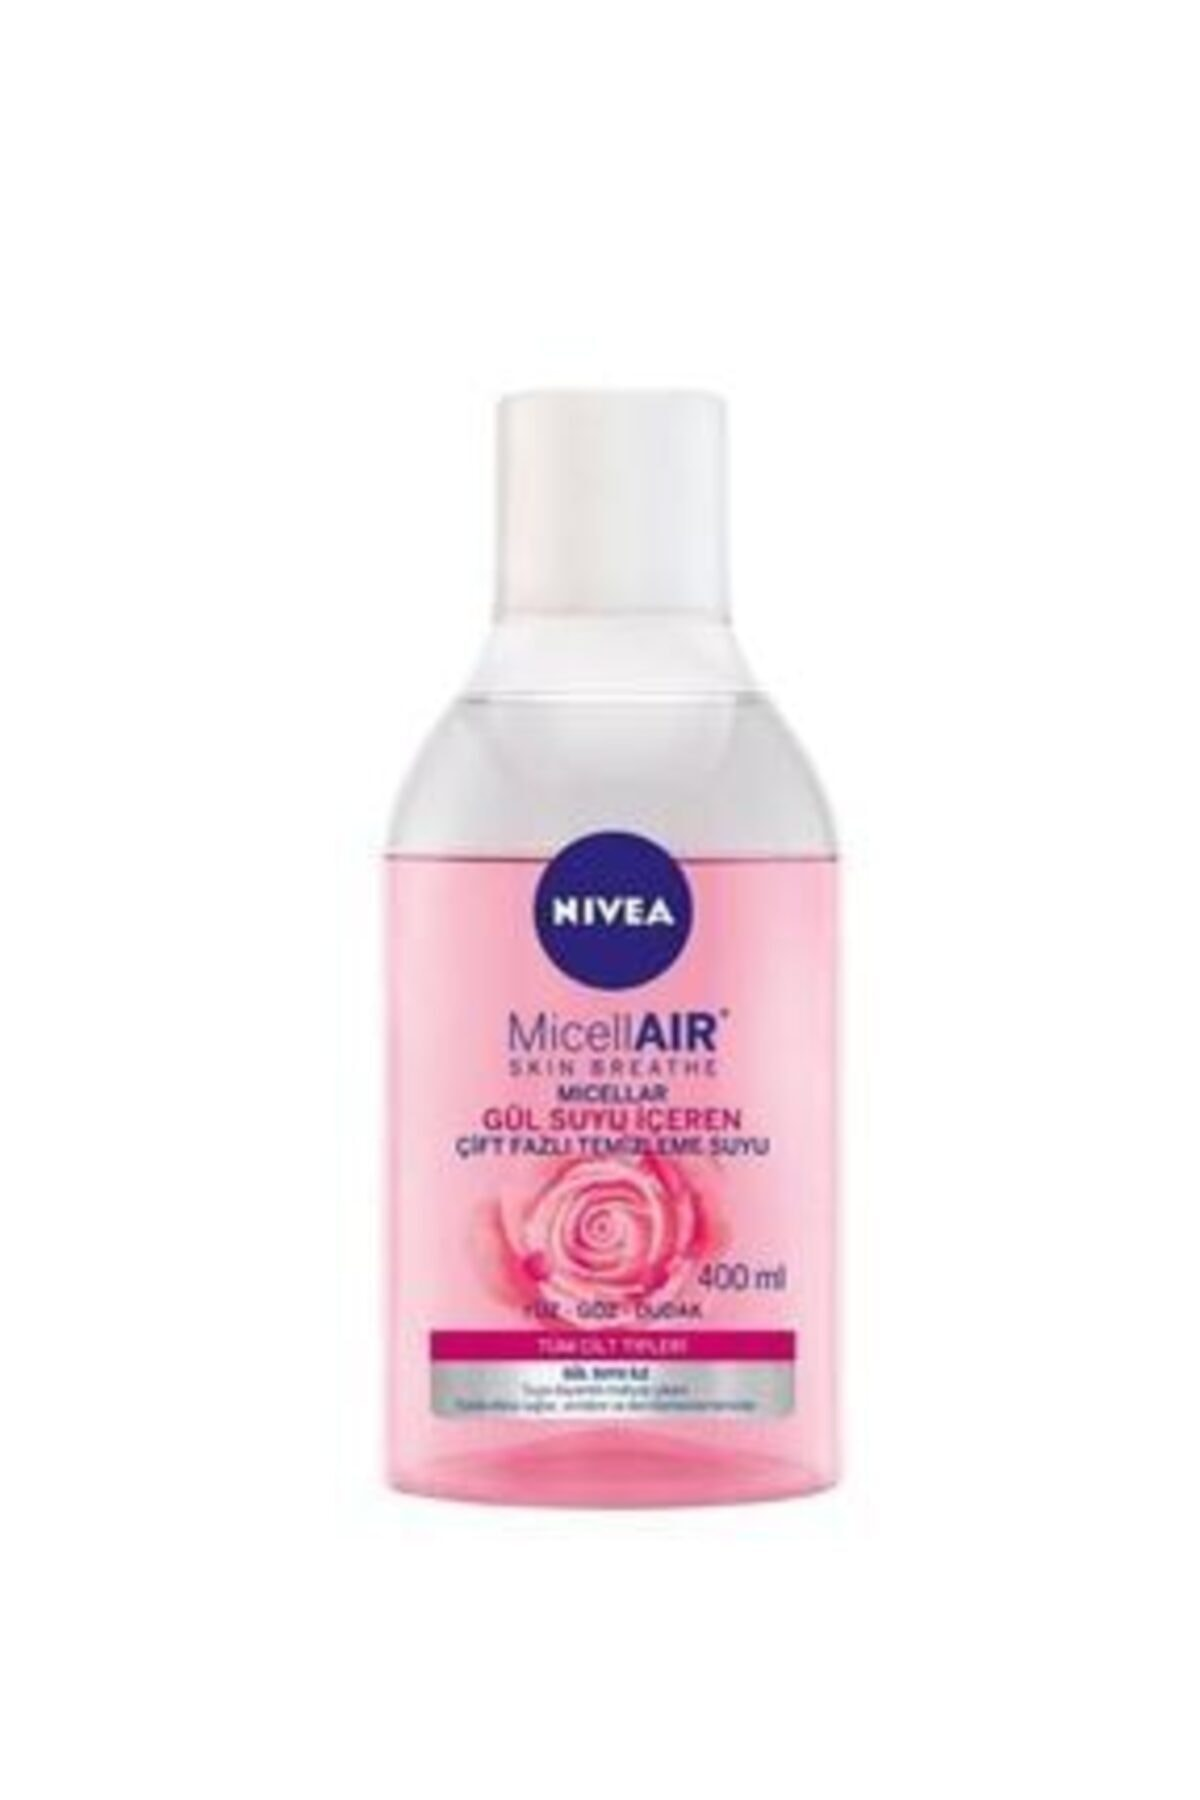 Rose Çift Fazli Makyaj Temizleme Suyu